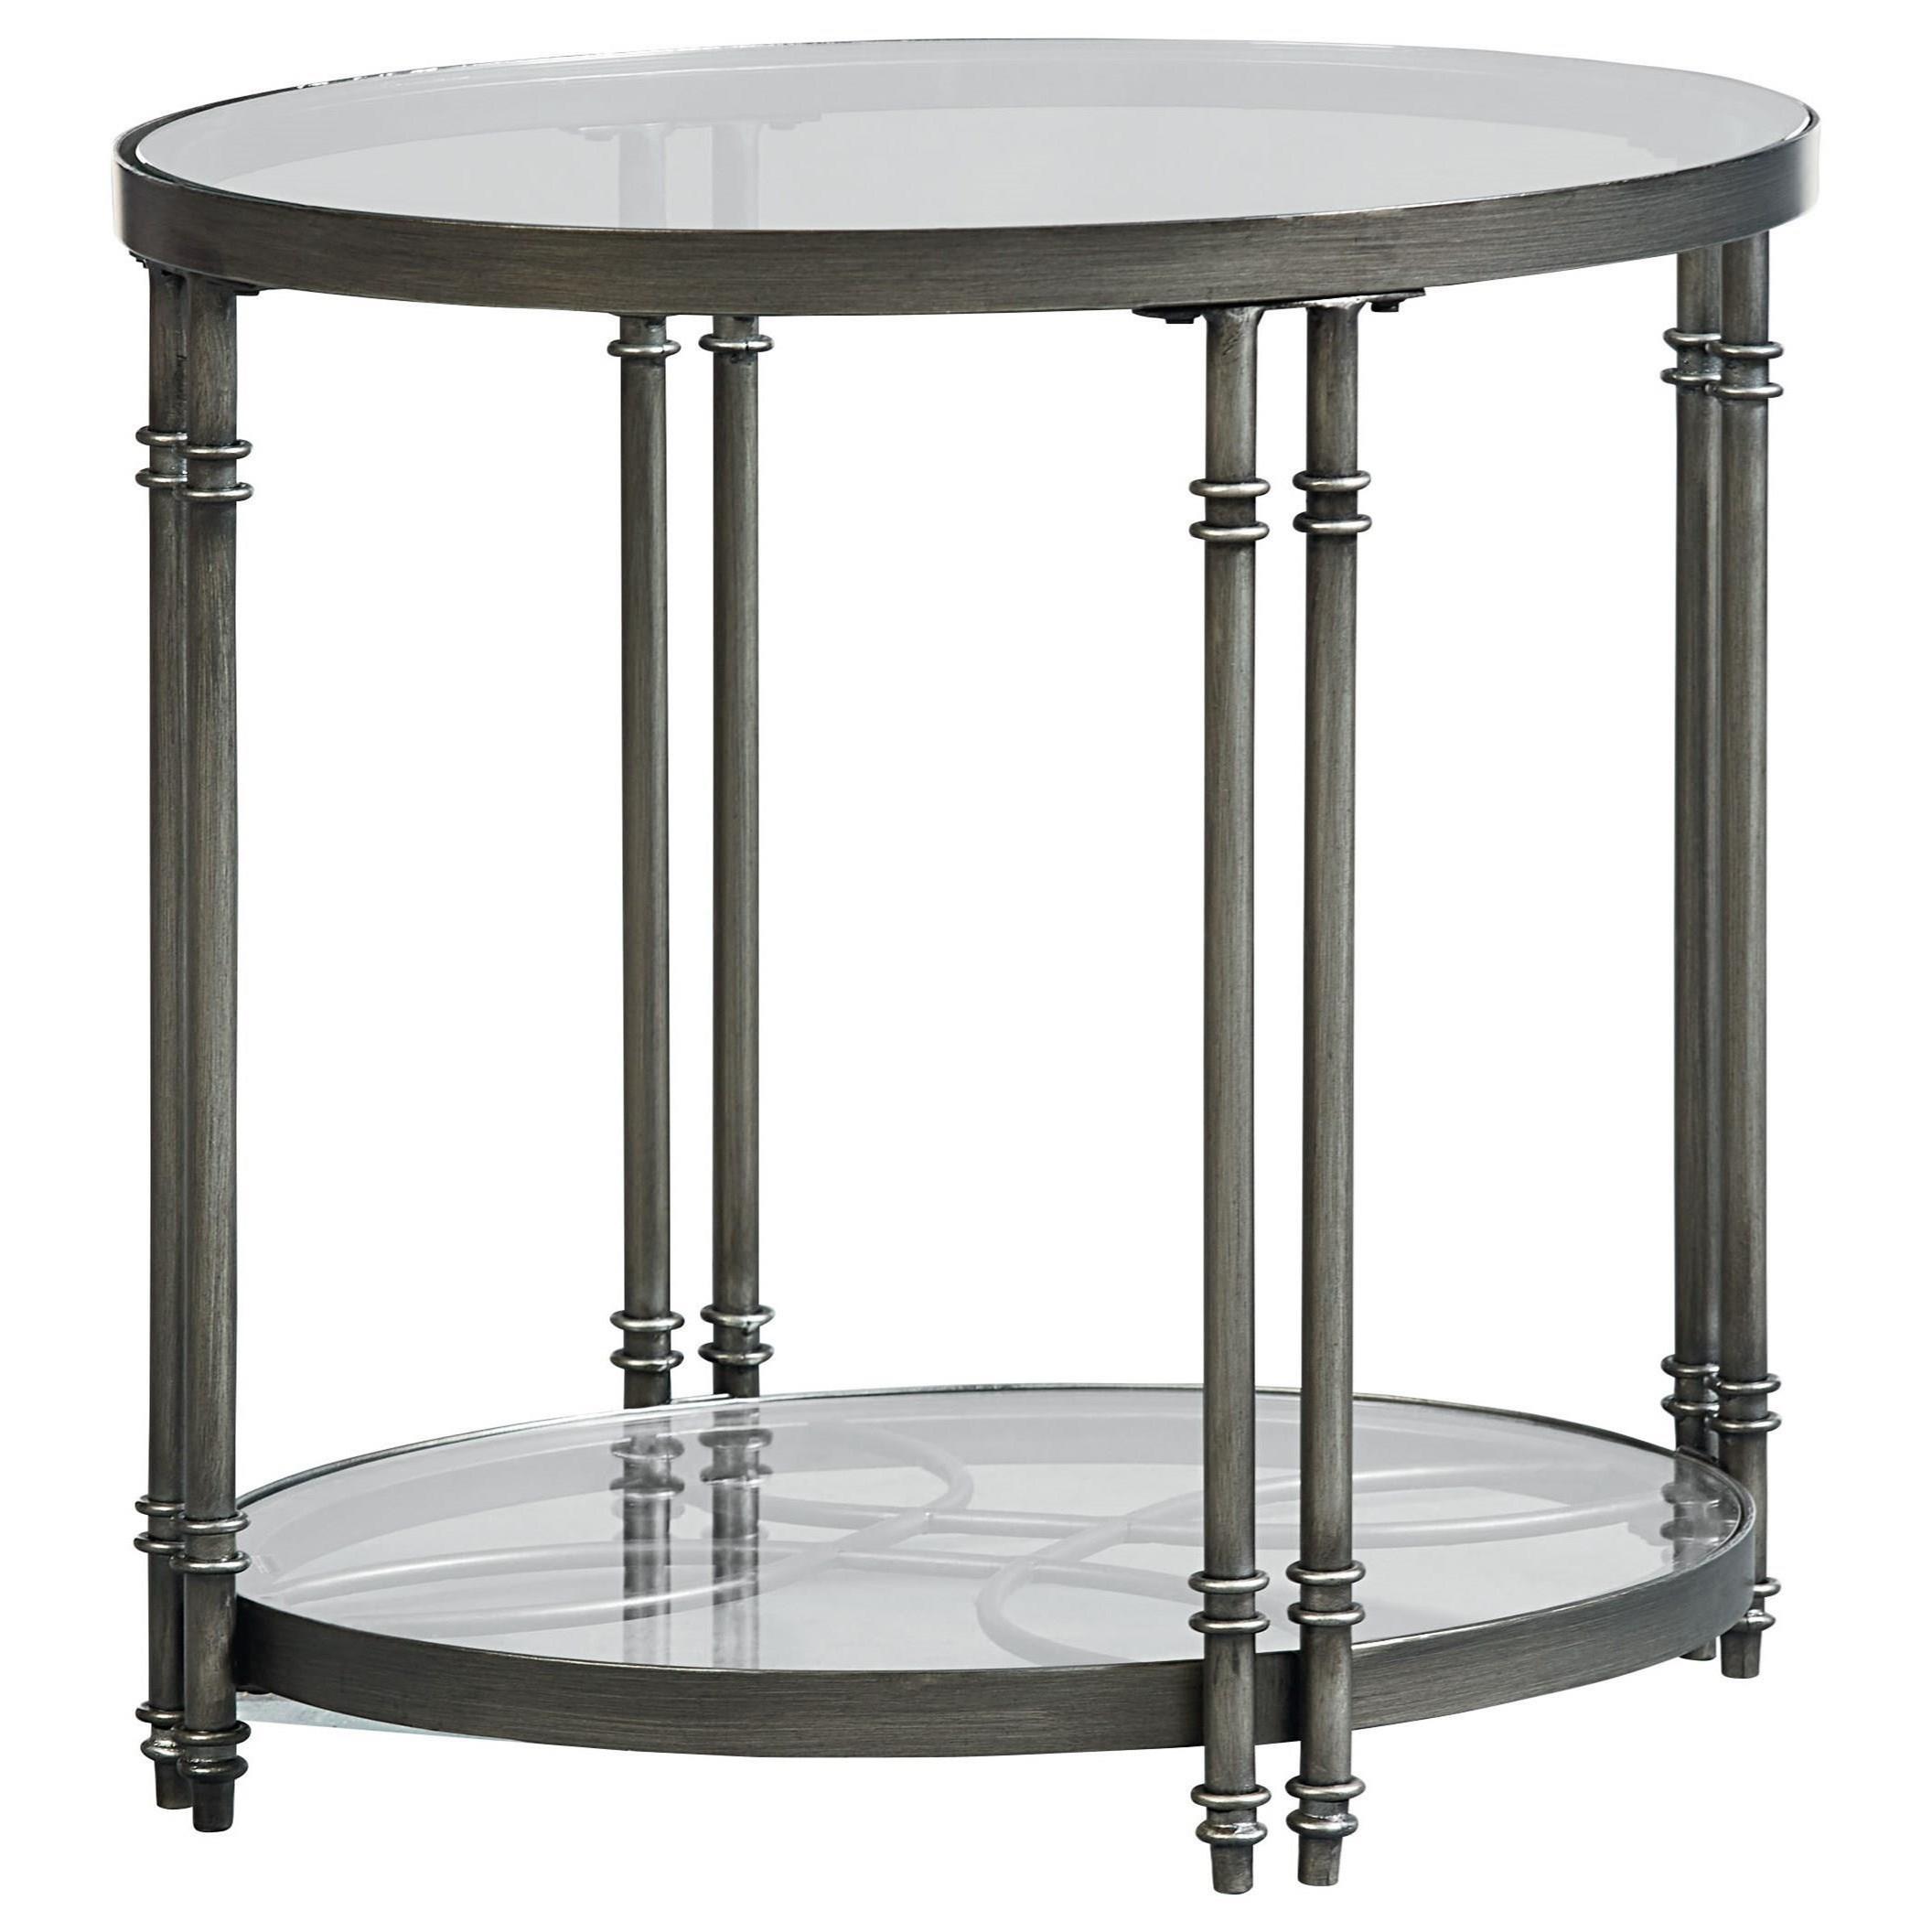 Standard Furniture Terrazza Contemporary Oval End Table